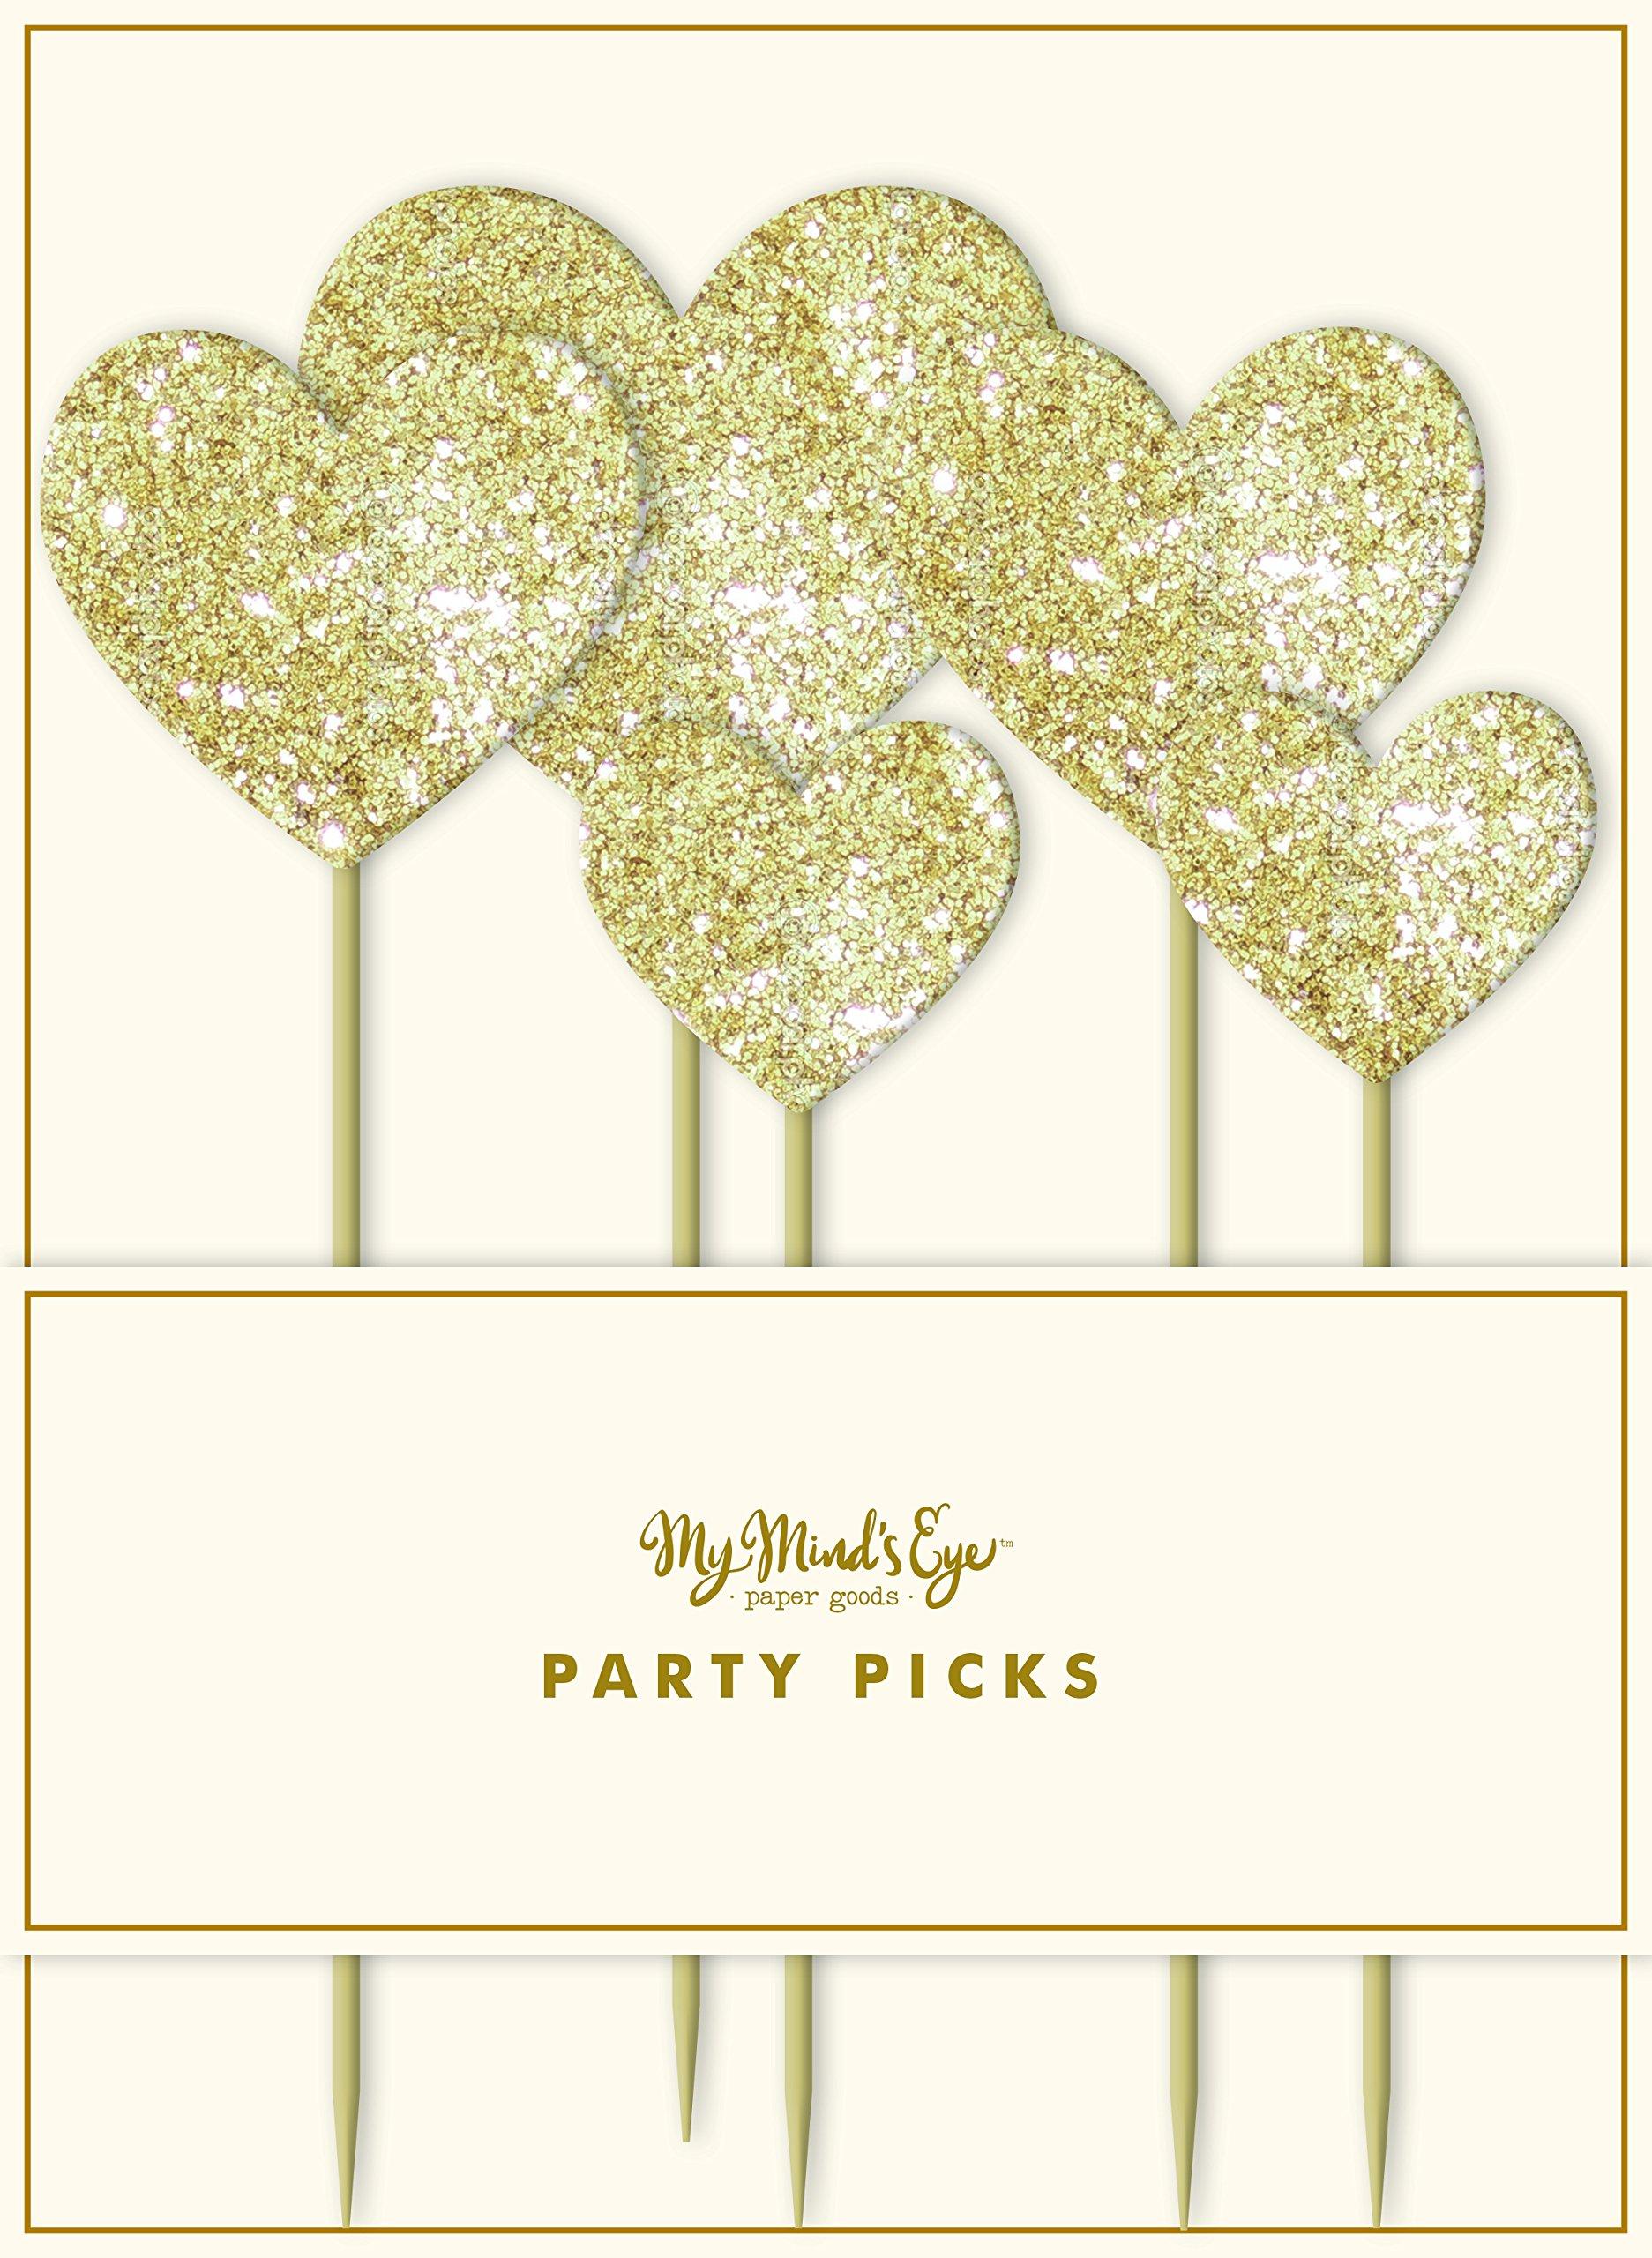 My Mind's Eye Fancy Heart Party Picks, 5 Count by My Mind's Eye